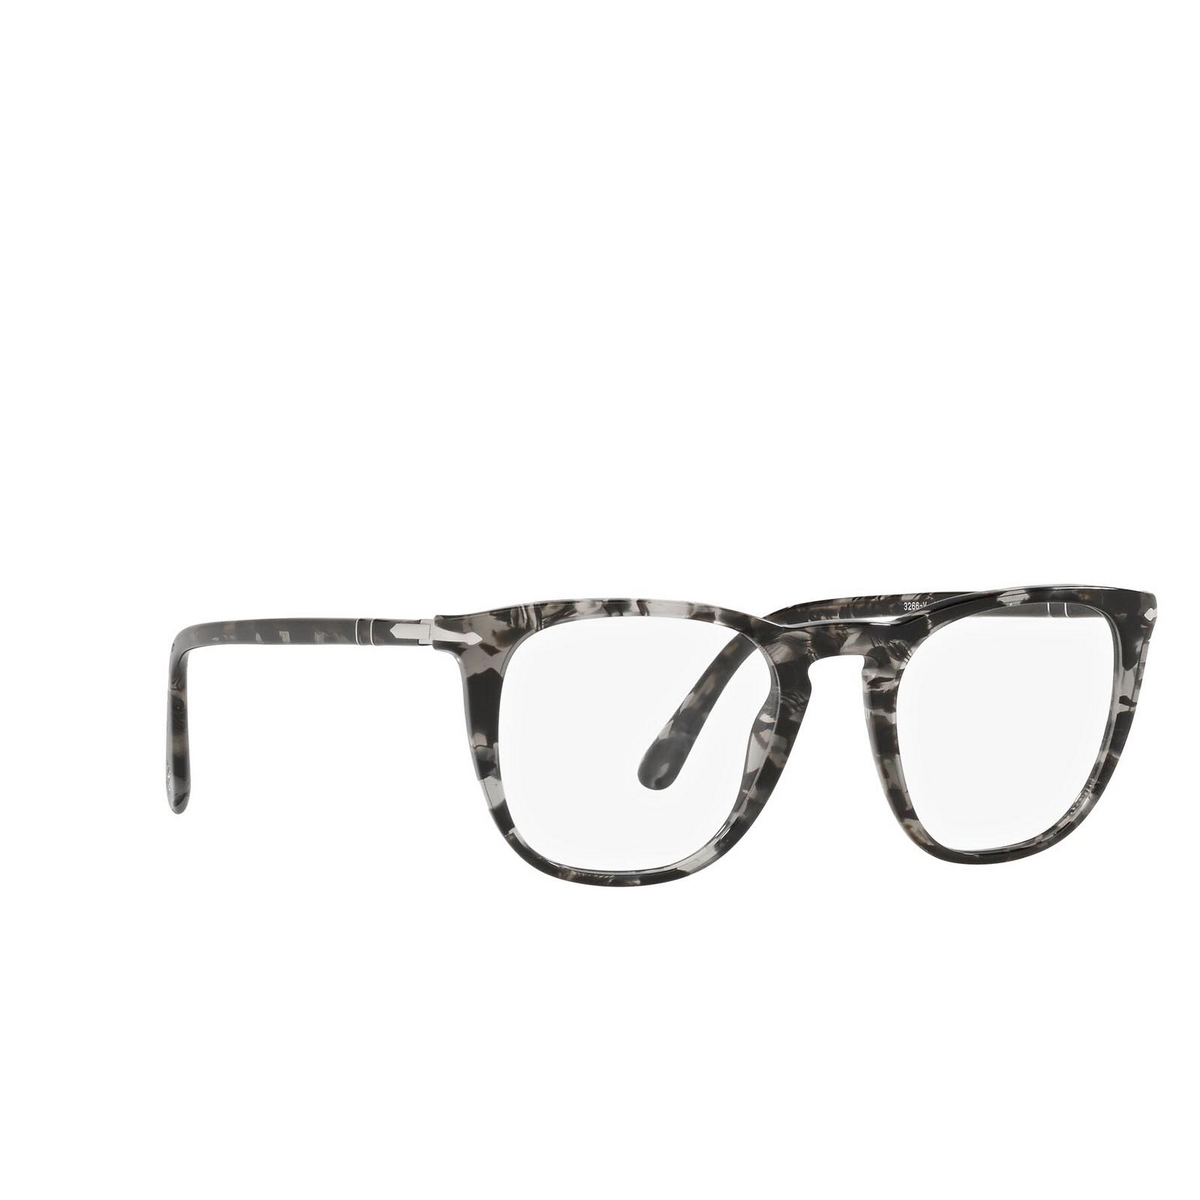 Persol® Square Eyeglasses: PO3266V color Grey Havana 1080 - three-quarters view.